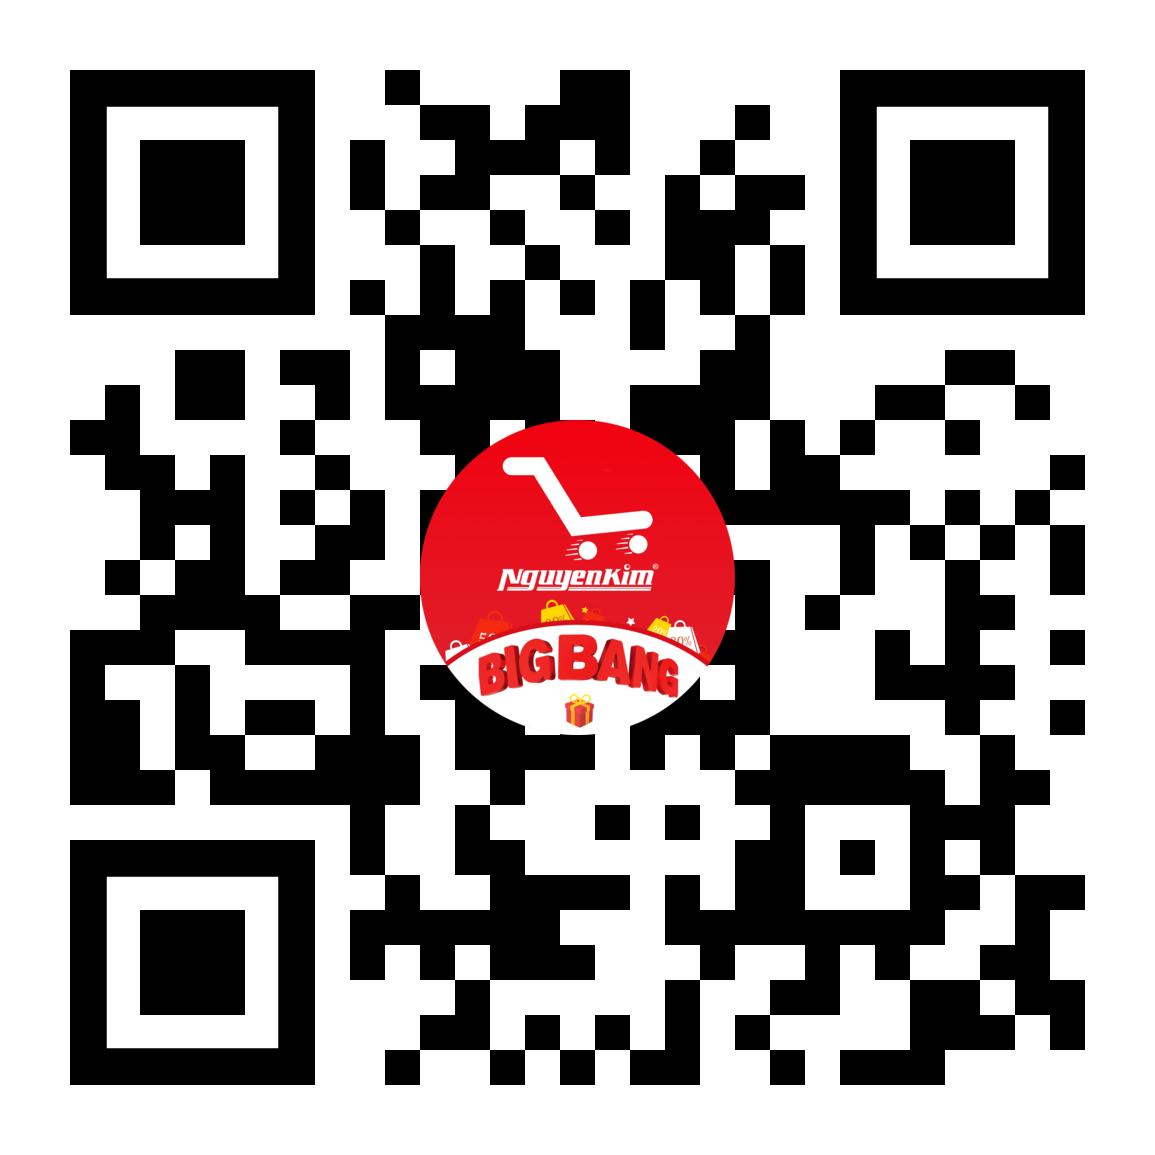 Tải Nguyễn Kim trên Mobile App